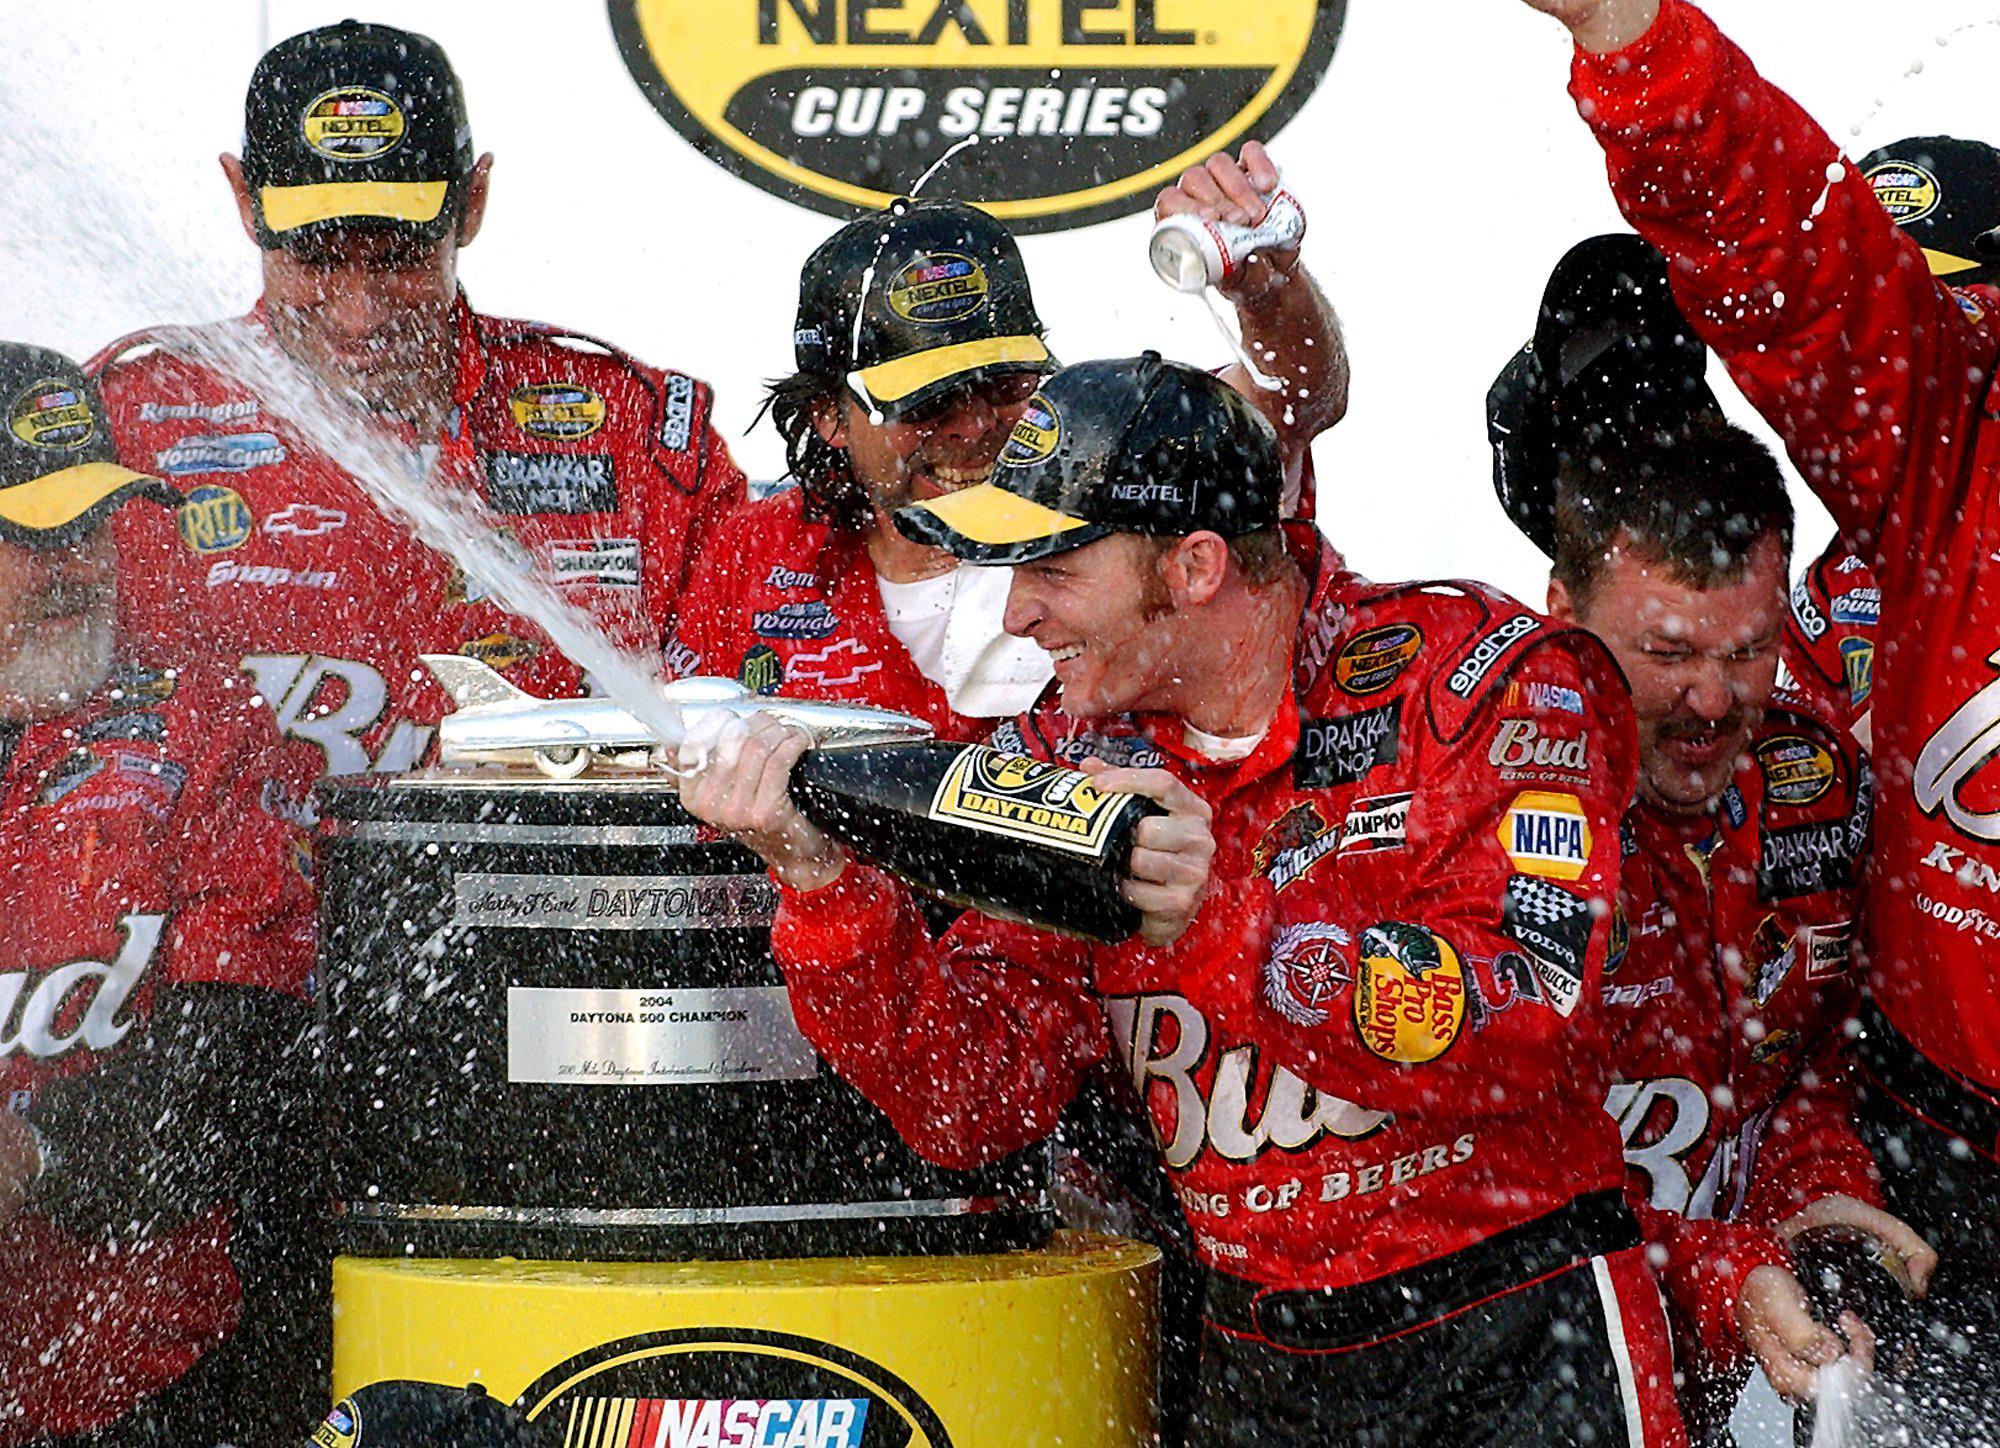 Dale Earnhardt Jr. Explains Why the Daytona 500 Is the Super Bowl of NASCAR